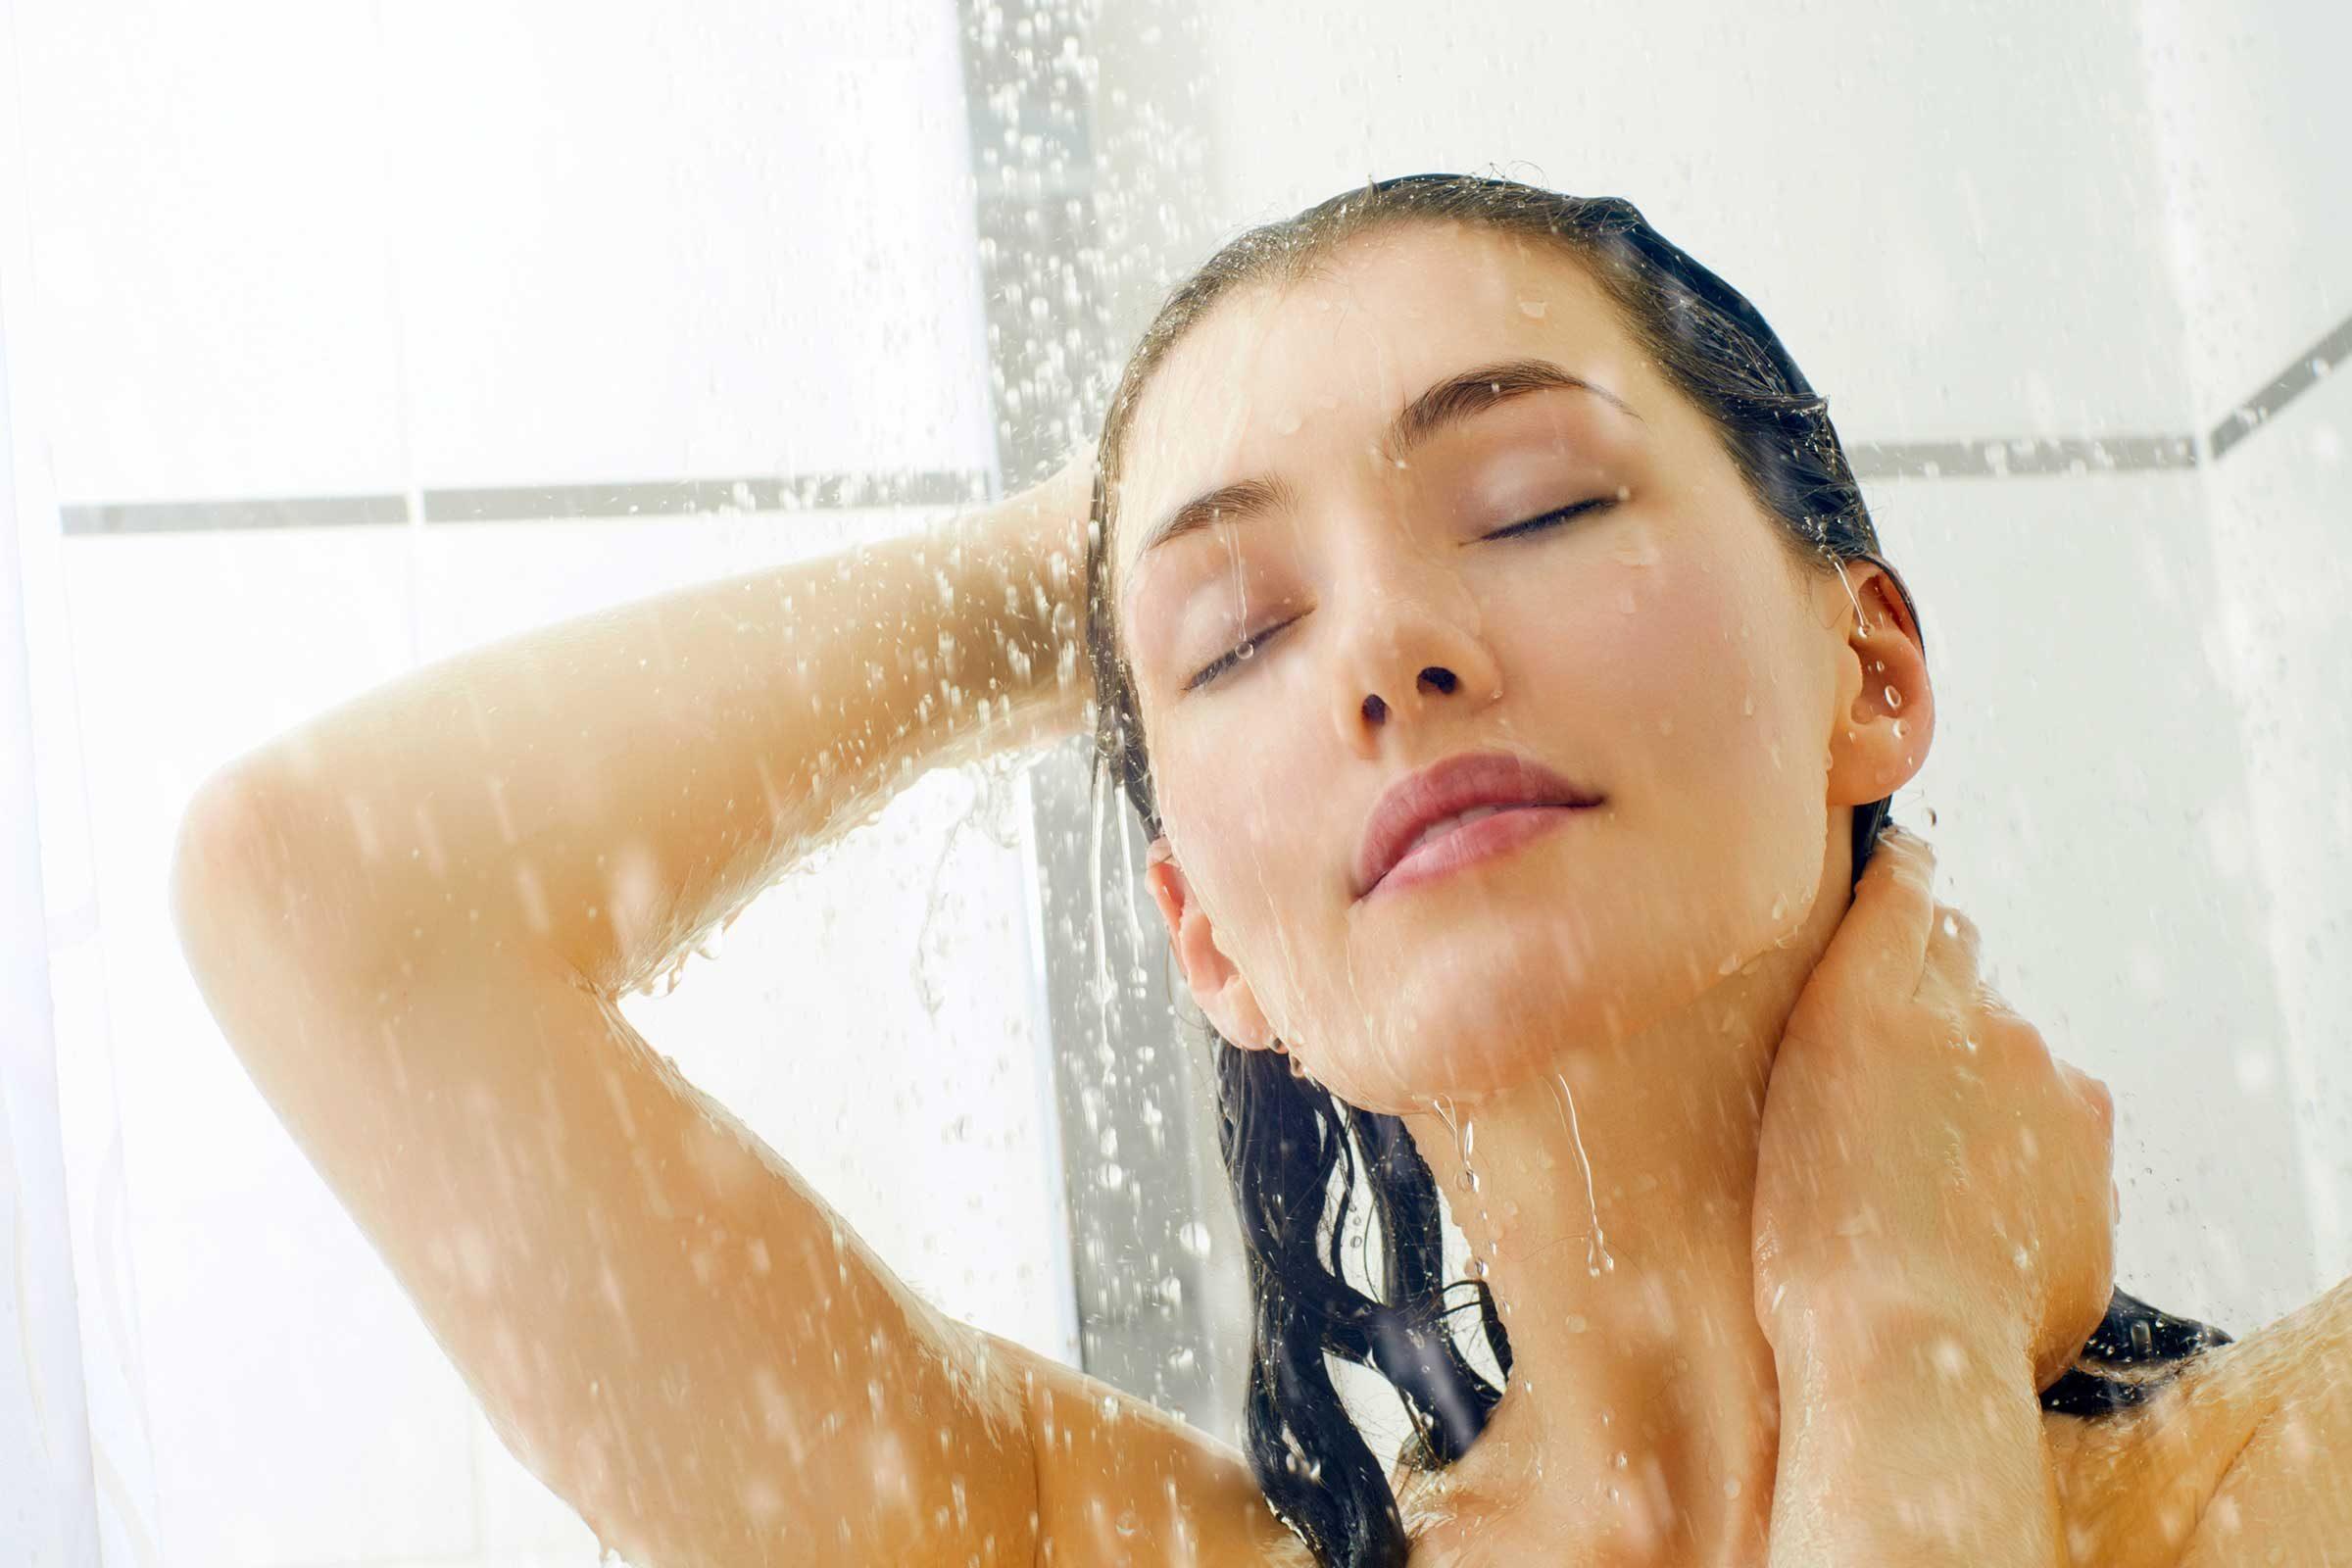 http://www.rd.com/wp-content/uploads/sites/2/2016/10/05_tricks_make_hair_color_last_longer_chill_shower_Choreograph.jpg